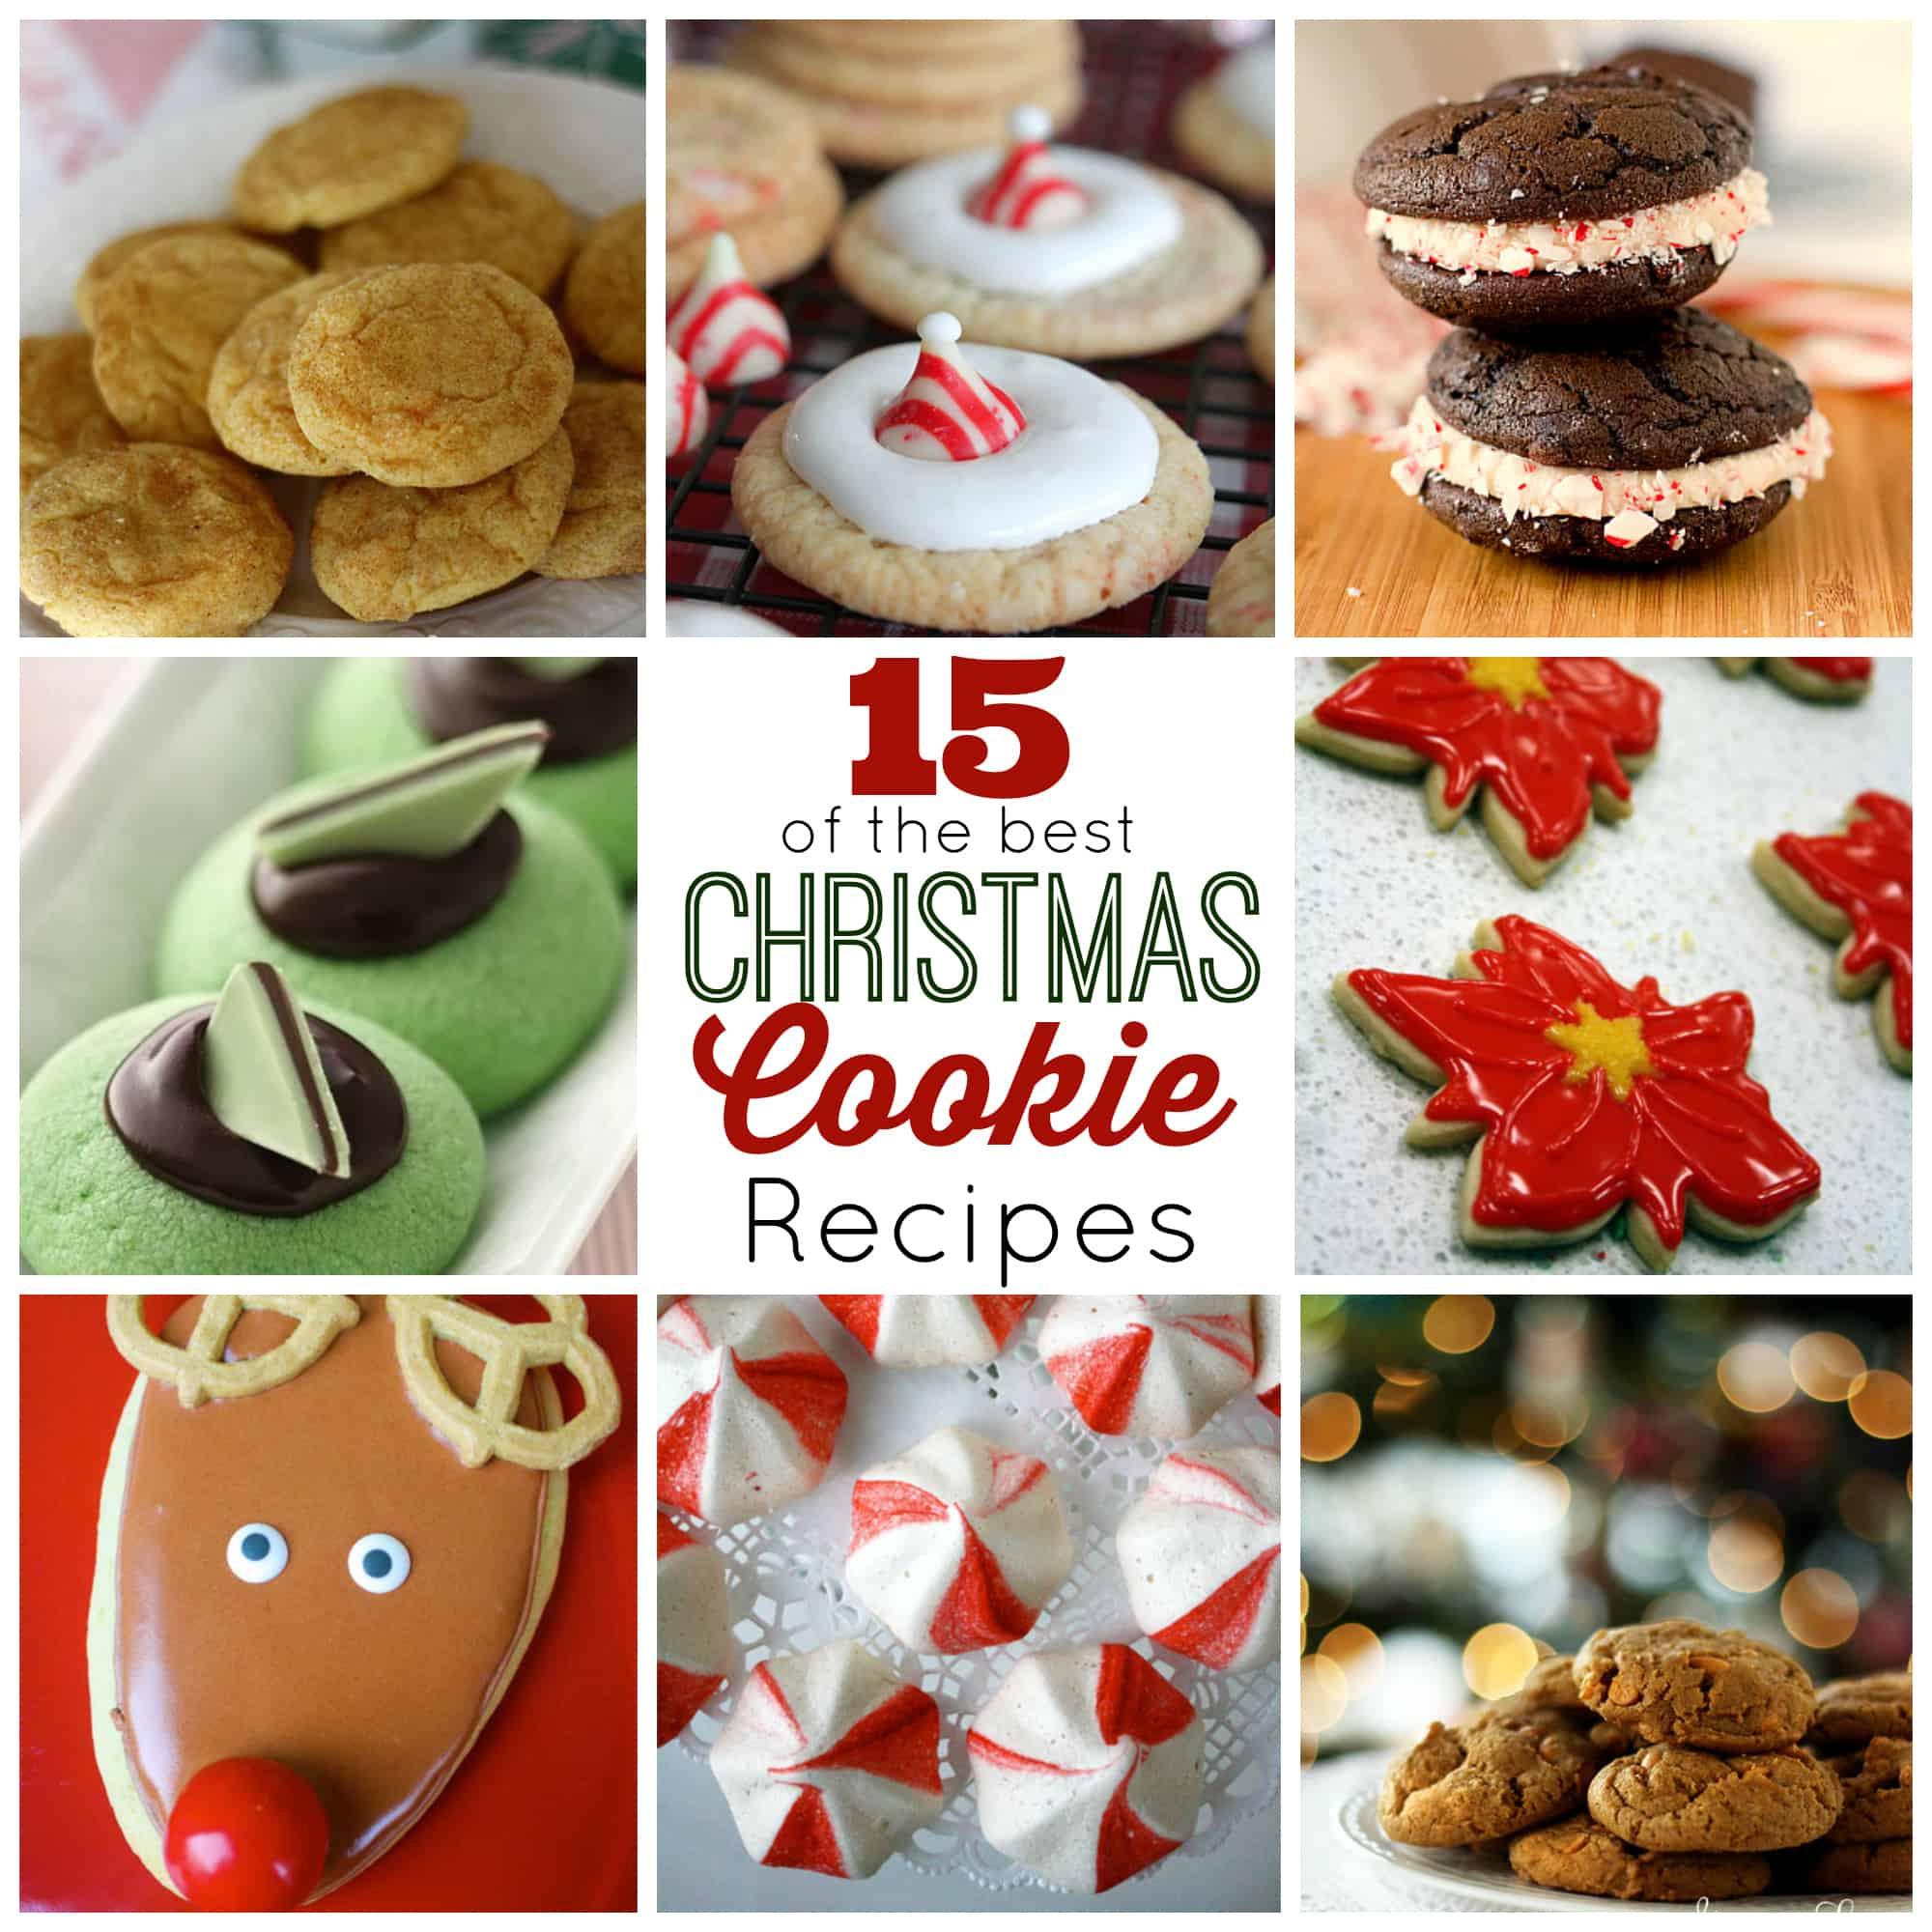 Best Christmas Cookies To Make  15 of the Best Christmas Cookies